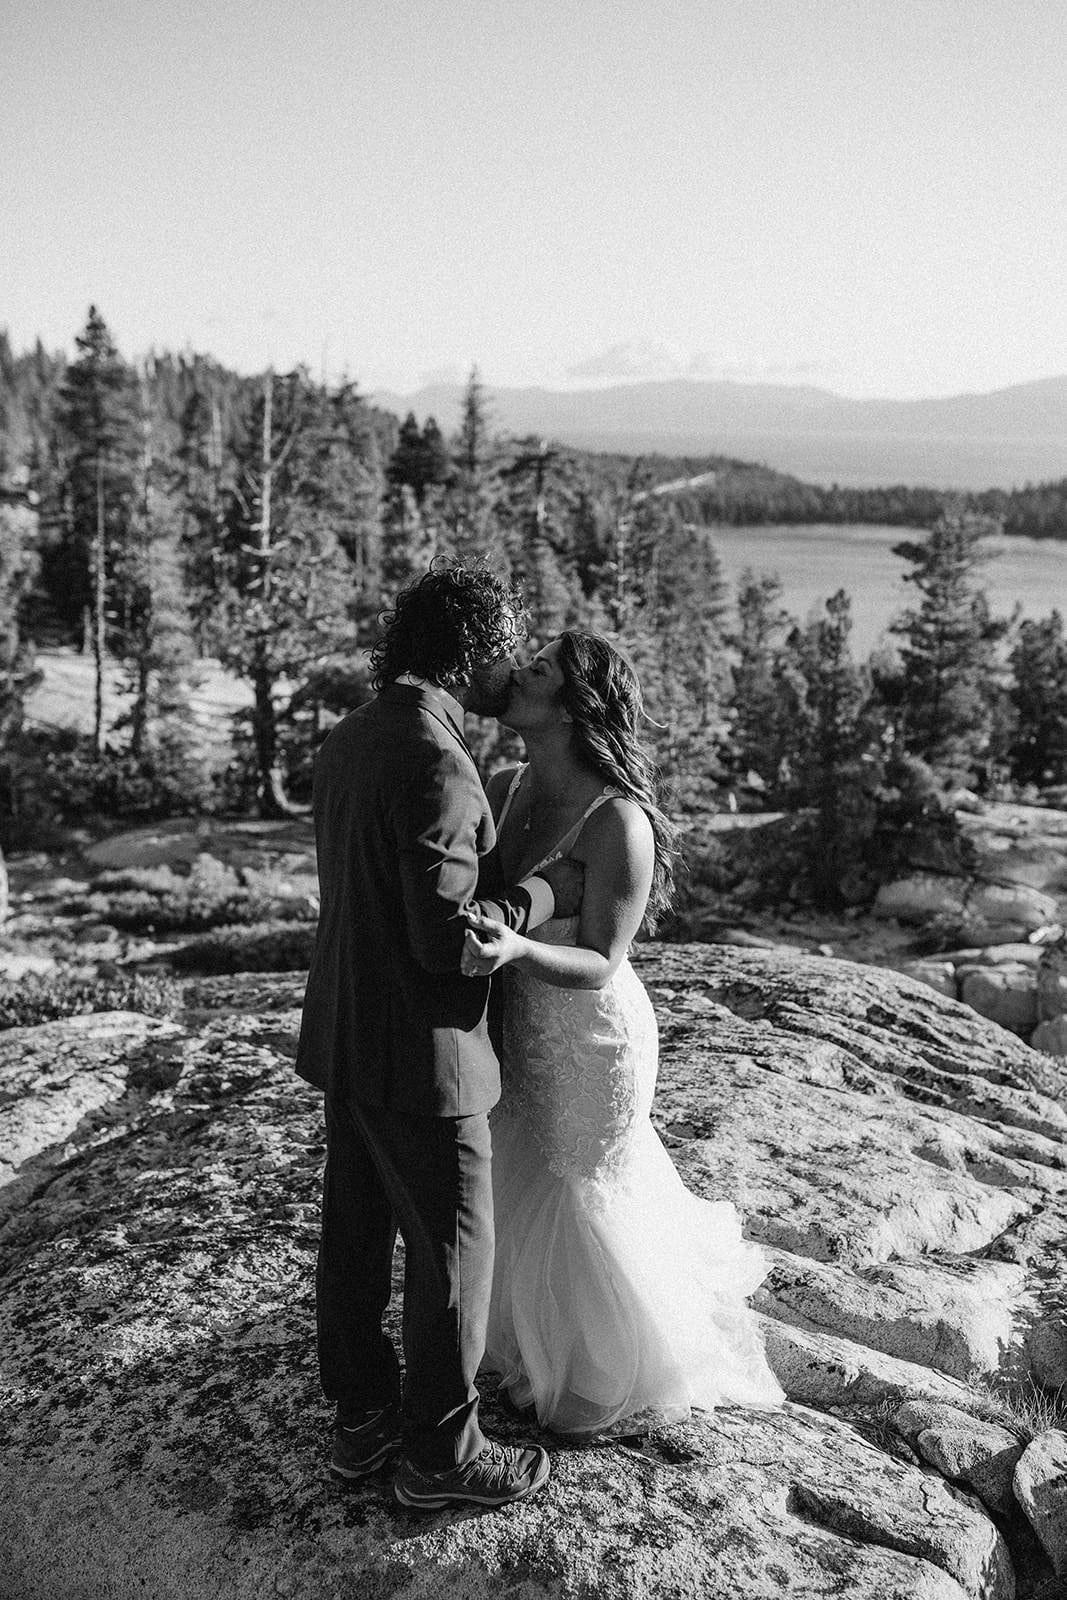 bride and groom slow dancing on wedding adventure